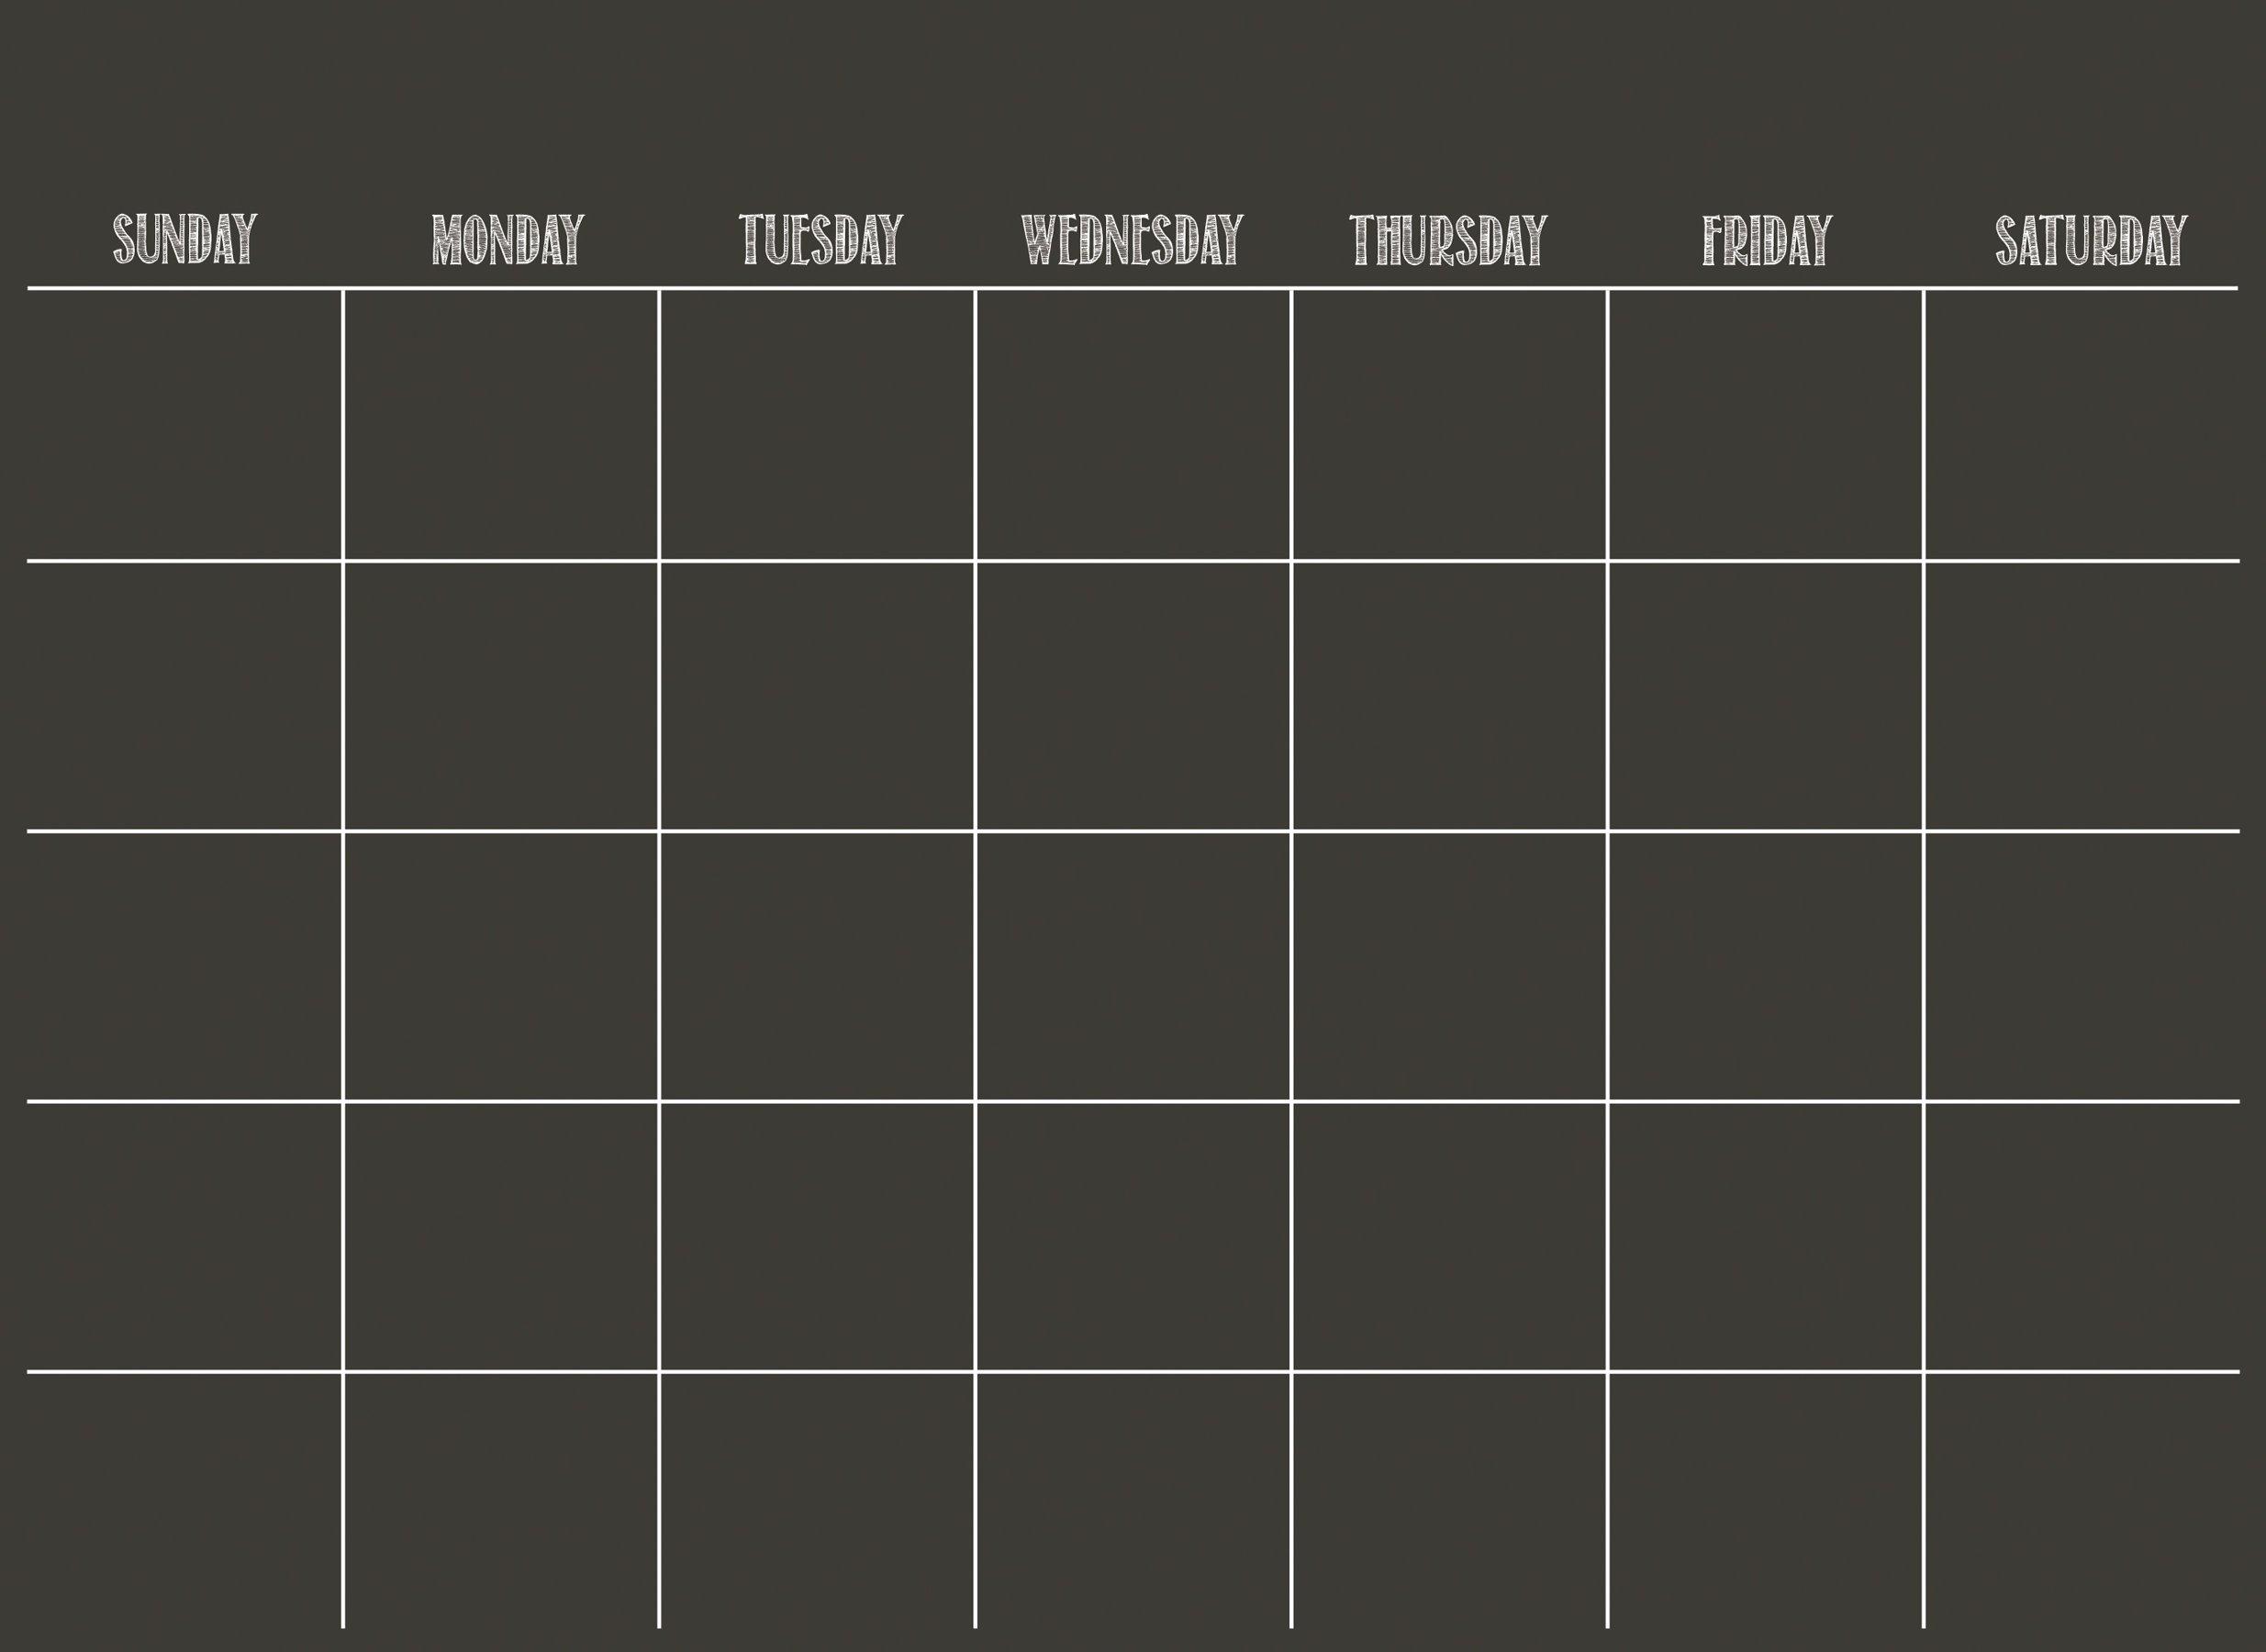 Wall Pops WPE0981 Black Dry Erase Calendar Decal